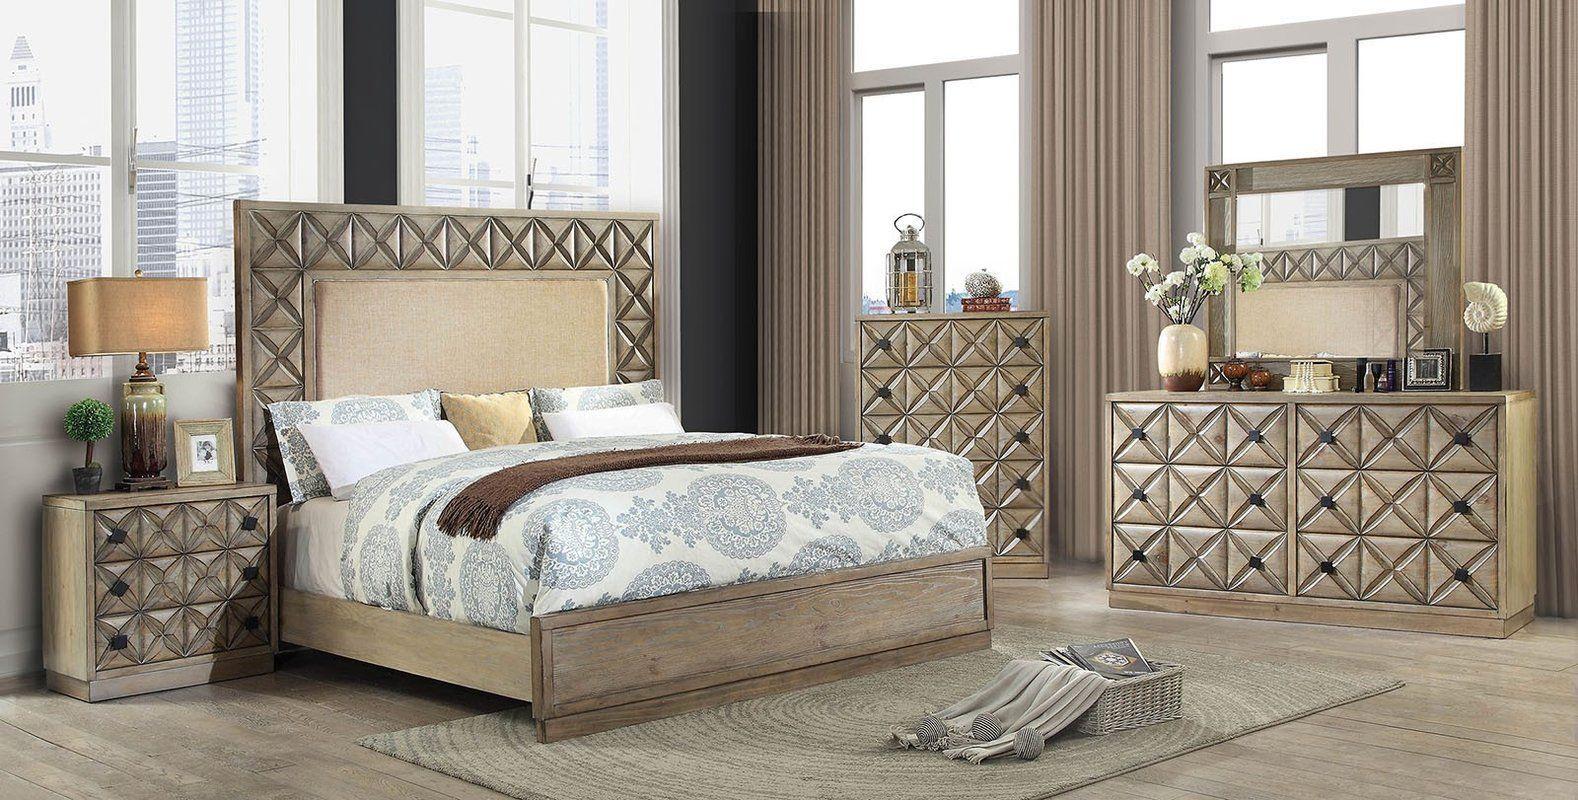 Northmoore Upholstered Panel Bed King bedroom sets